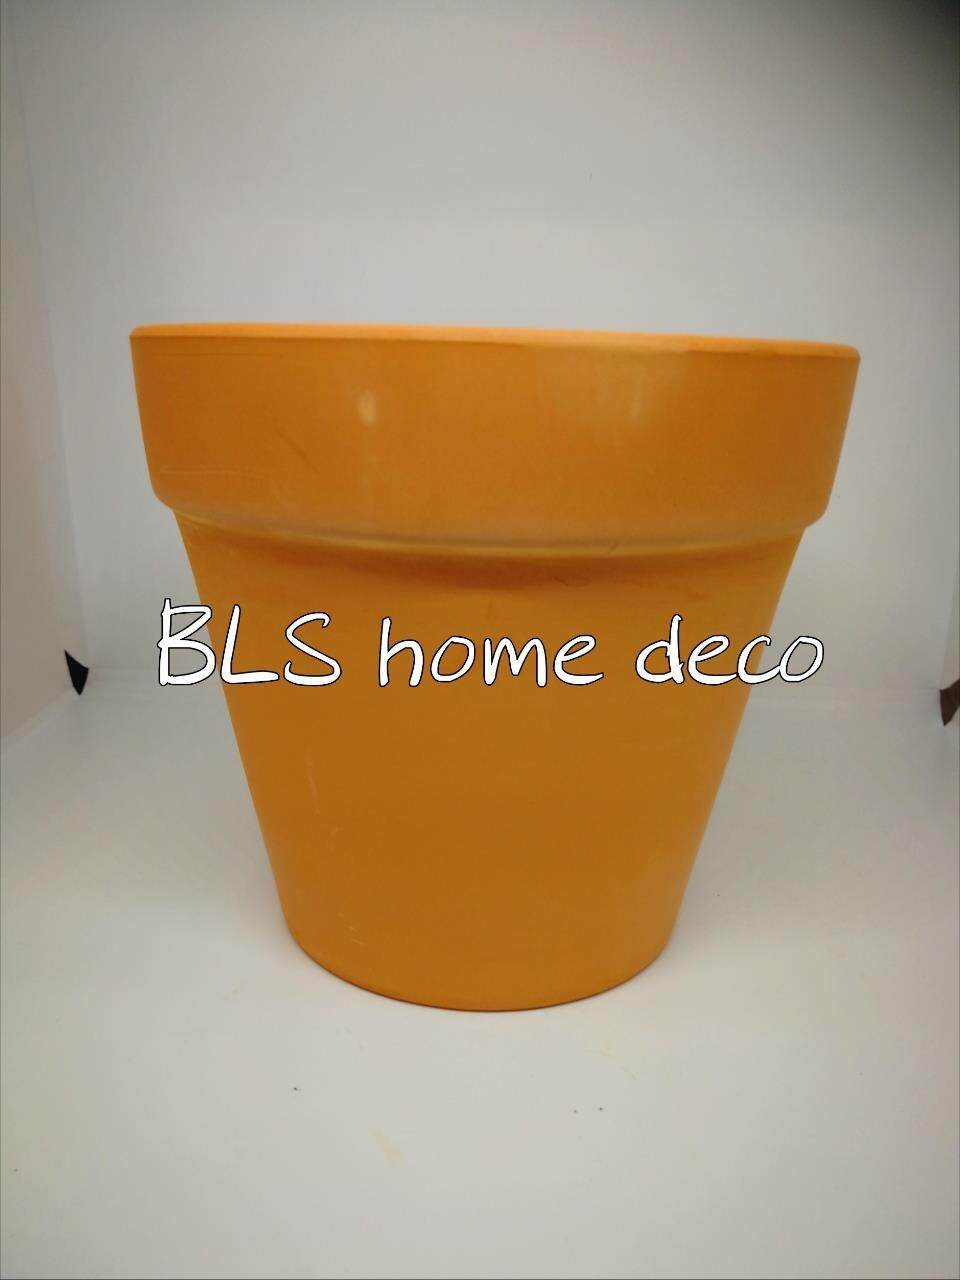 Home Pots Planters Urns Buy Home Pots Planters Urns At Best